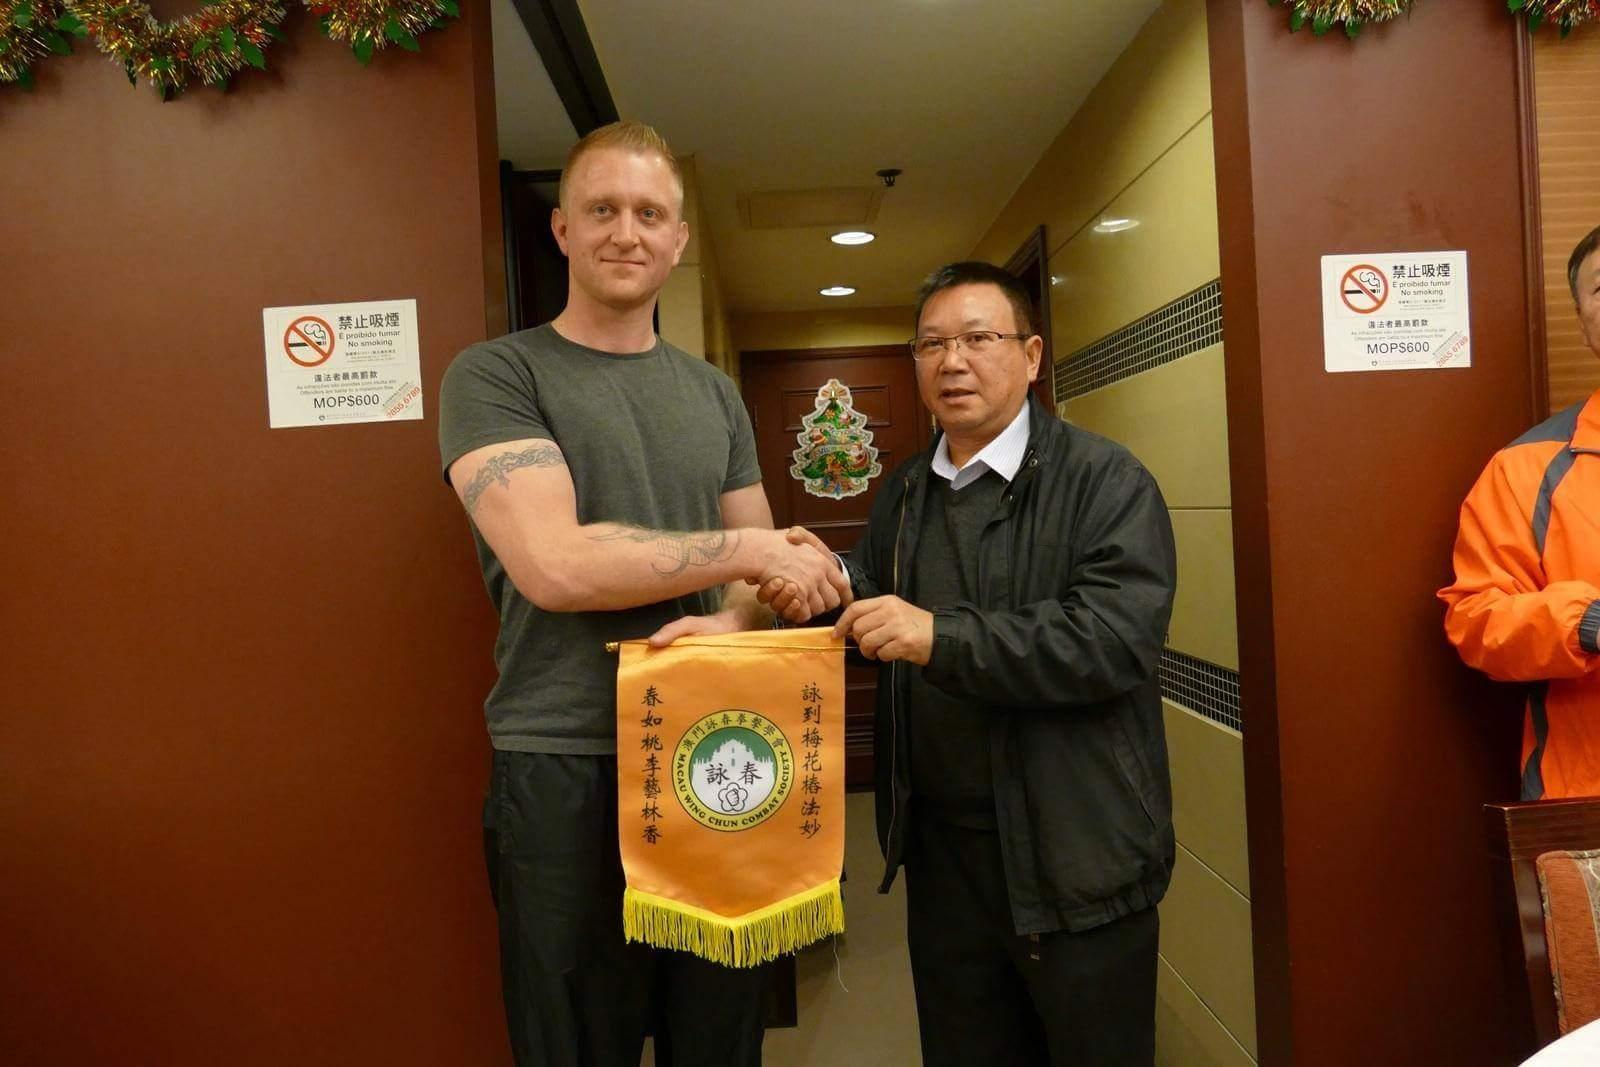 Robert Ley in Macau with M.r K K Mak the Macau Wing Chun Martial Arts Federation Chairman.